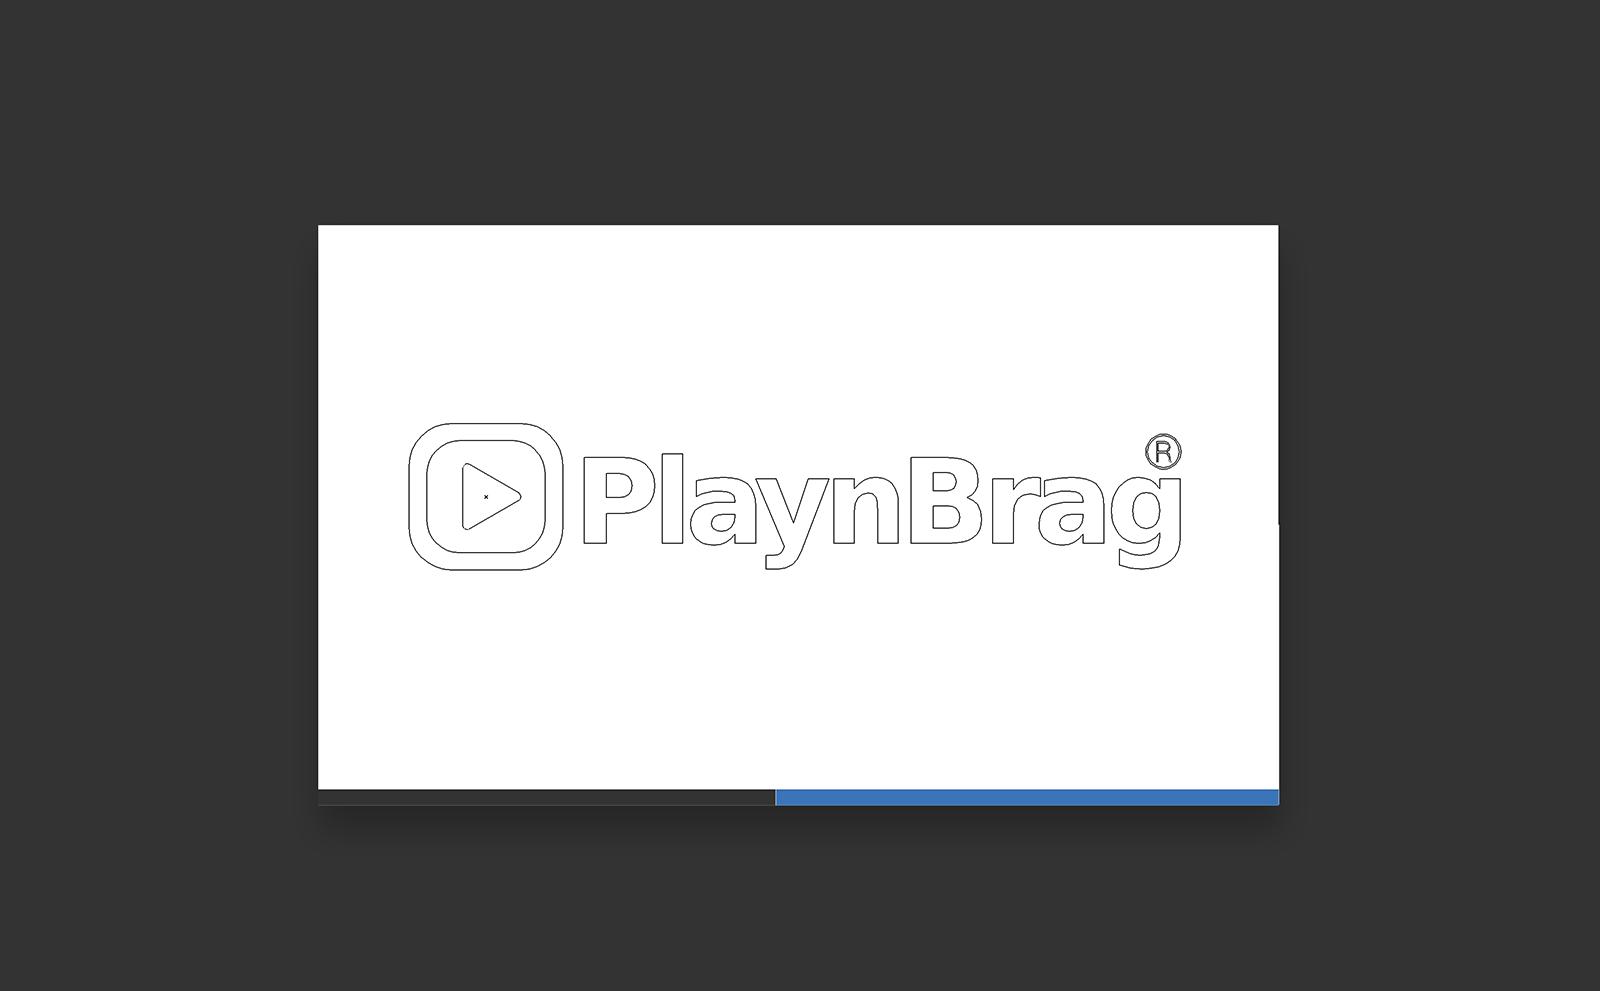 Playnbrag Limited 4